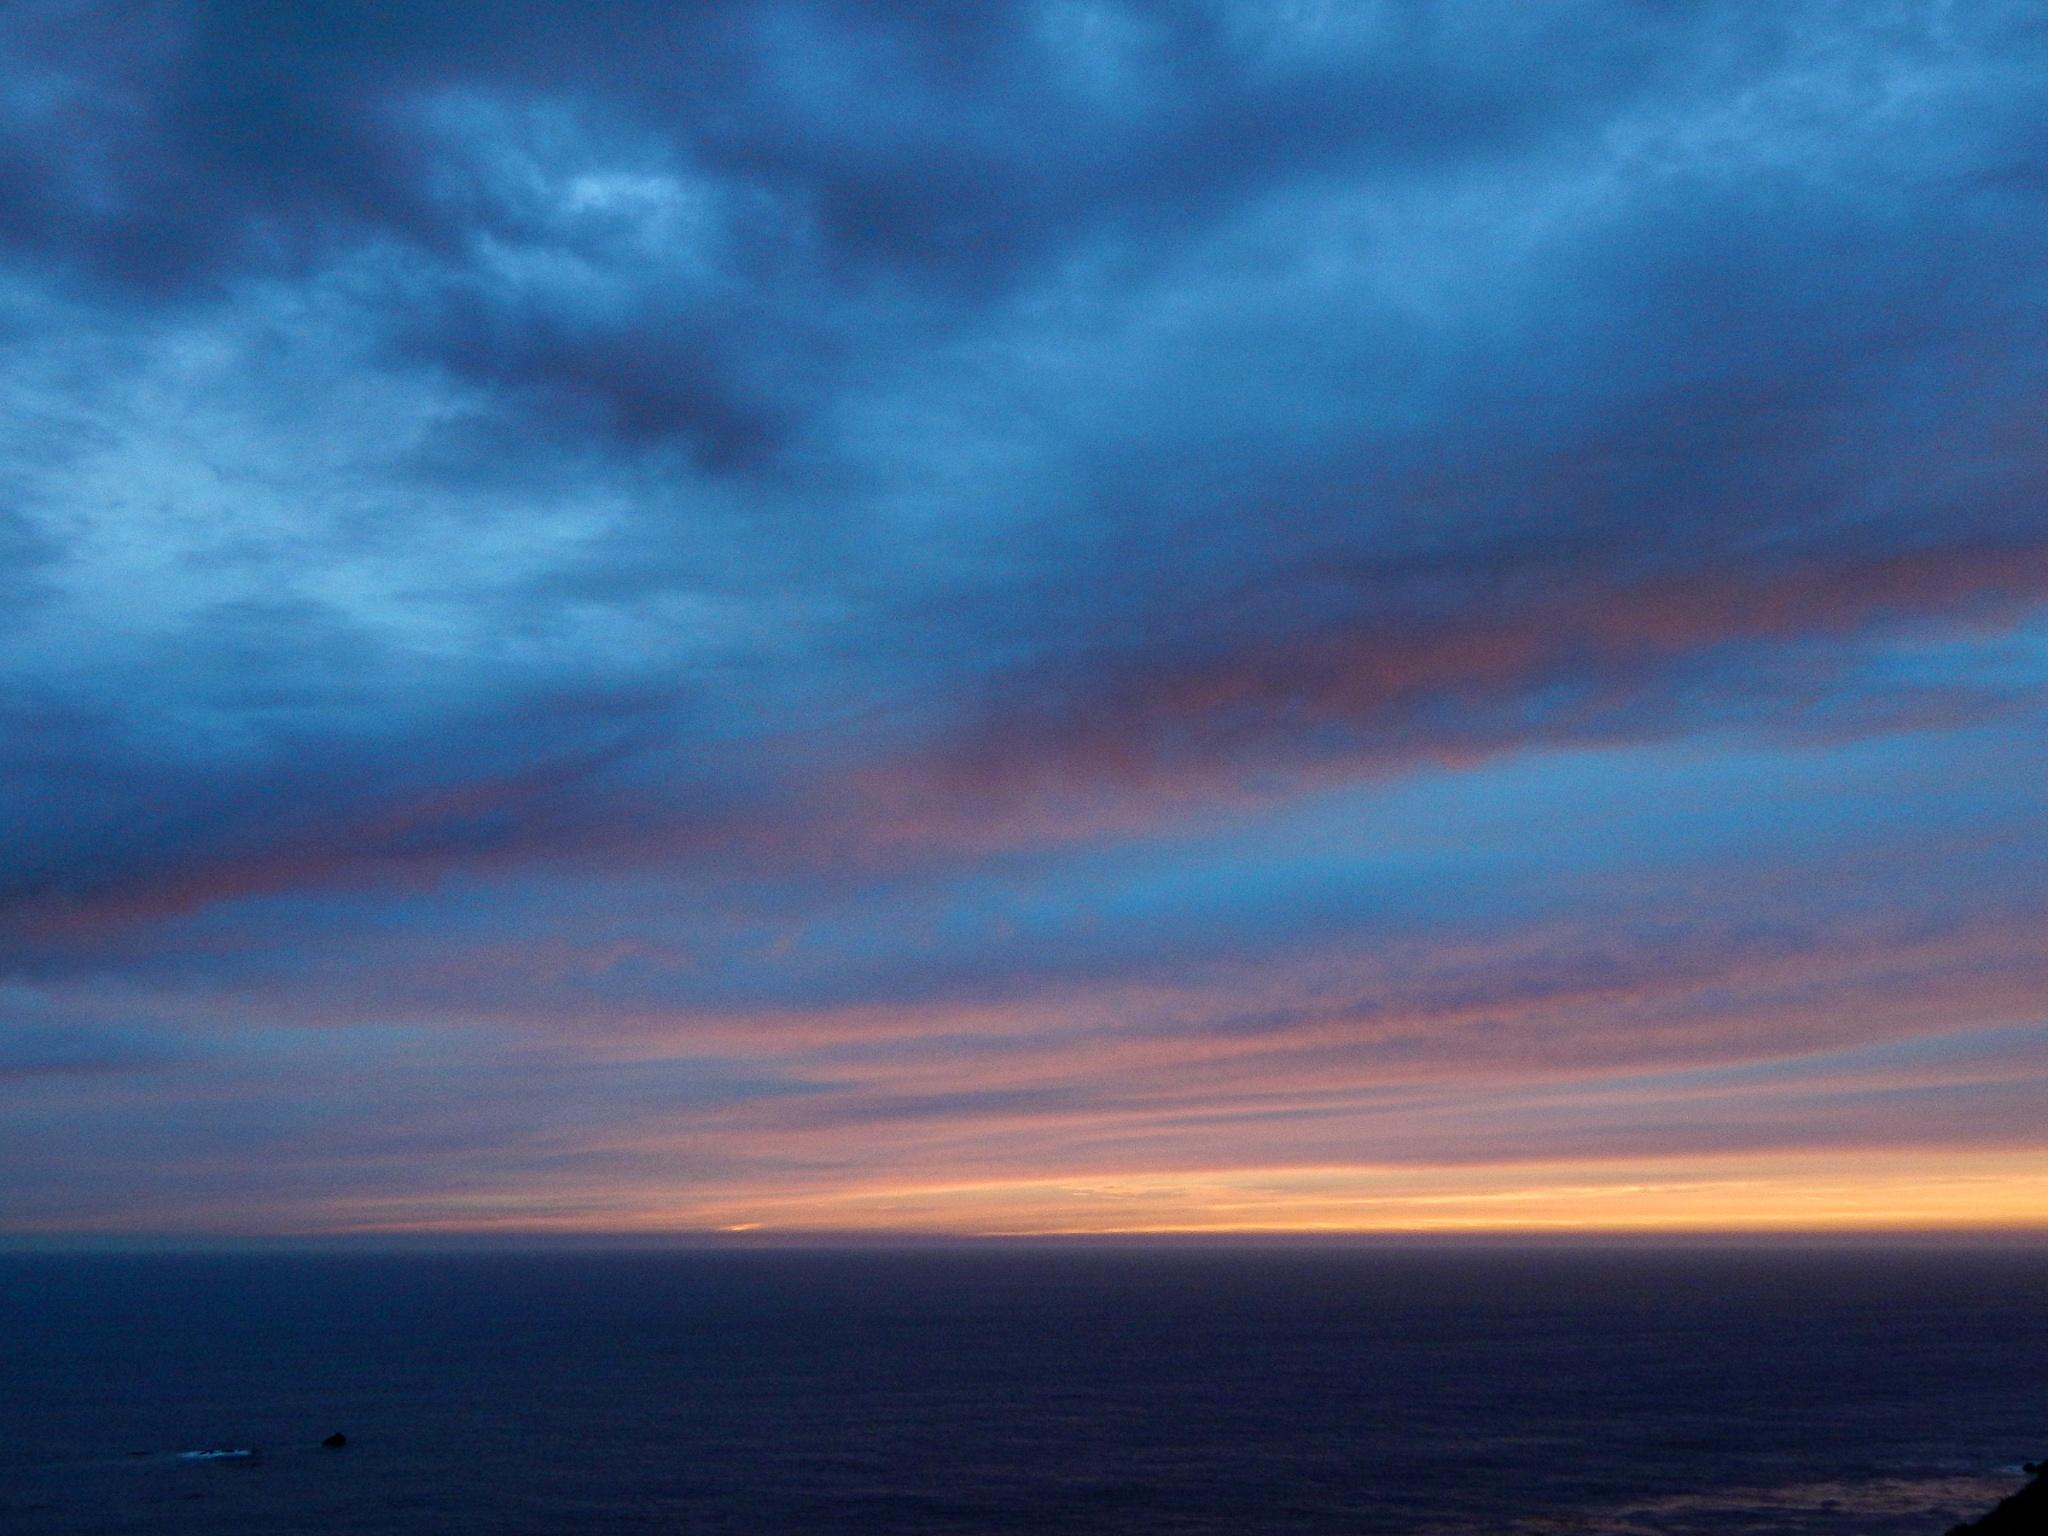 Sunset California highway one. by Freddy Martinez